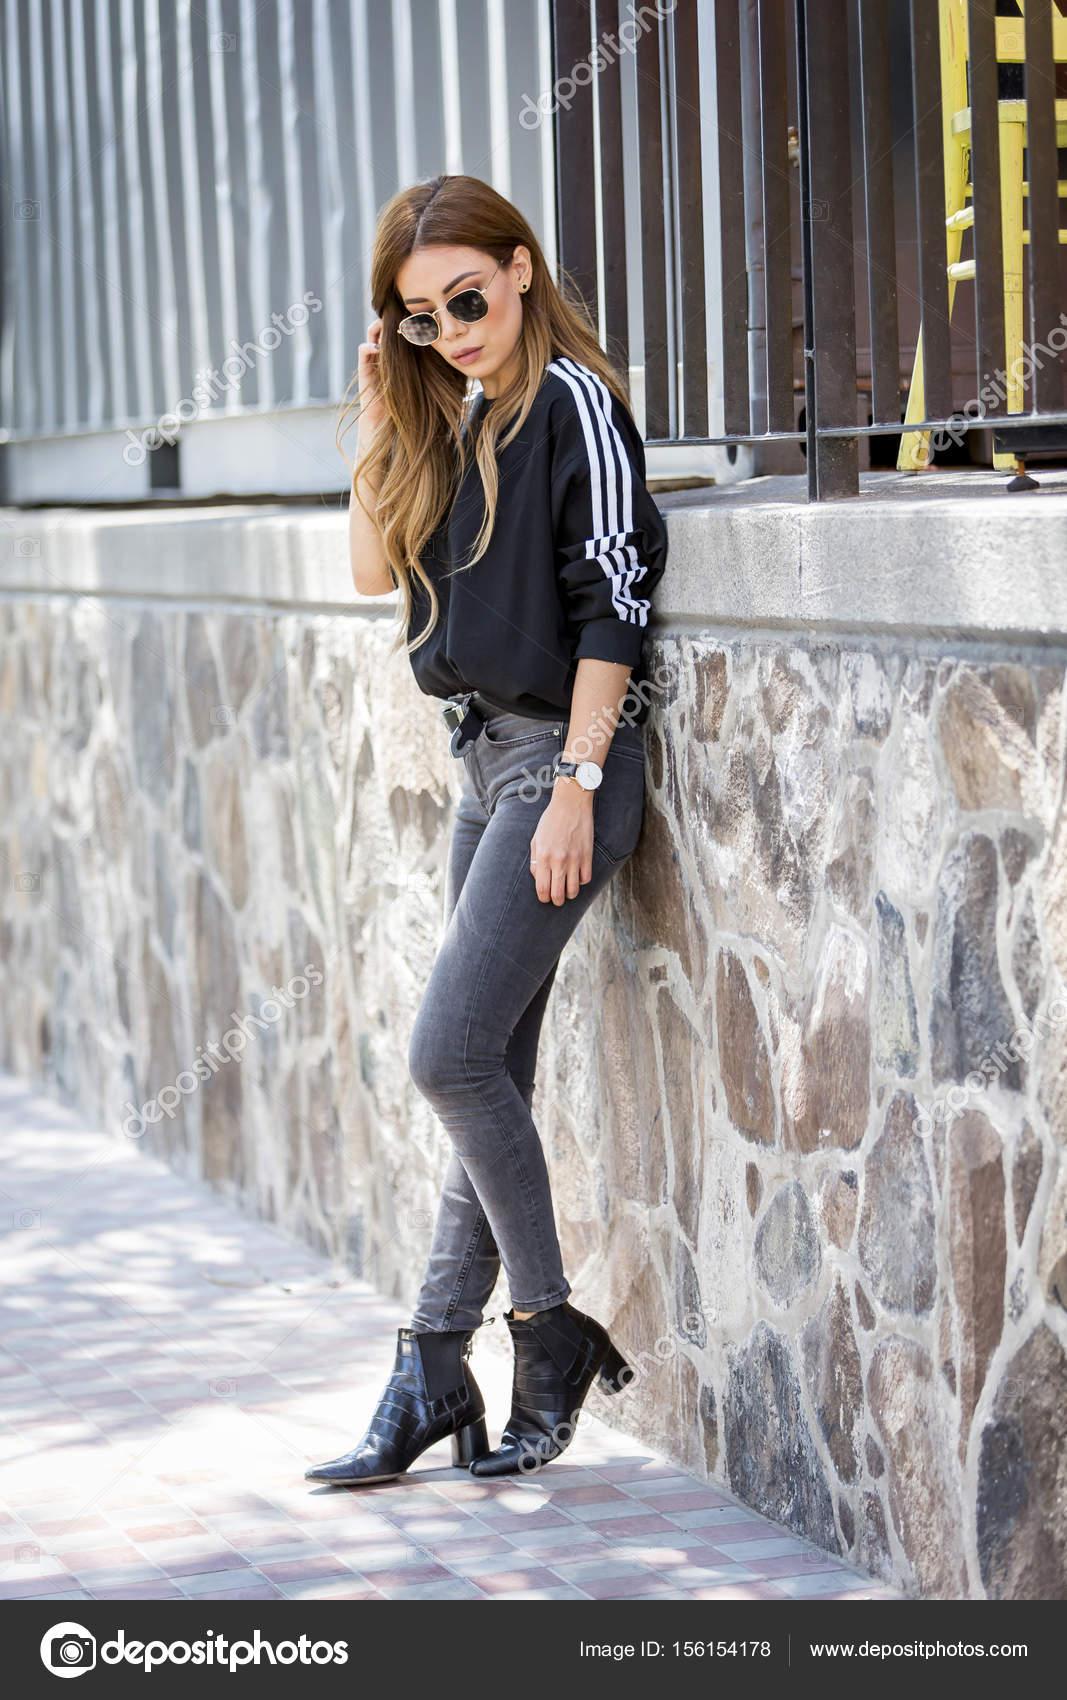 44653ac06ba3 Όμορφη Νεαρή Γυναίκα Που Φοράει Μοντέρνα Ρούχα Περπάτημα Στο Δρόμο —  Φωτογραφία Αρχείου